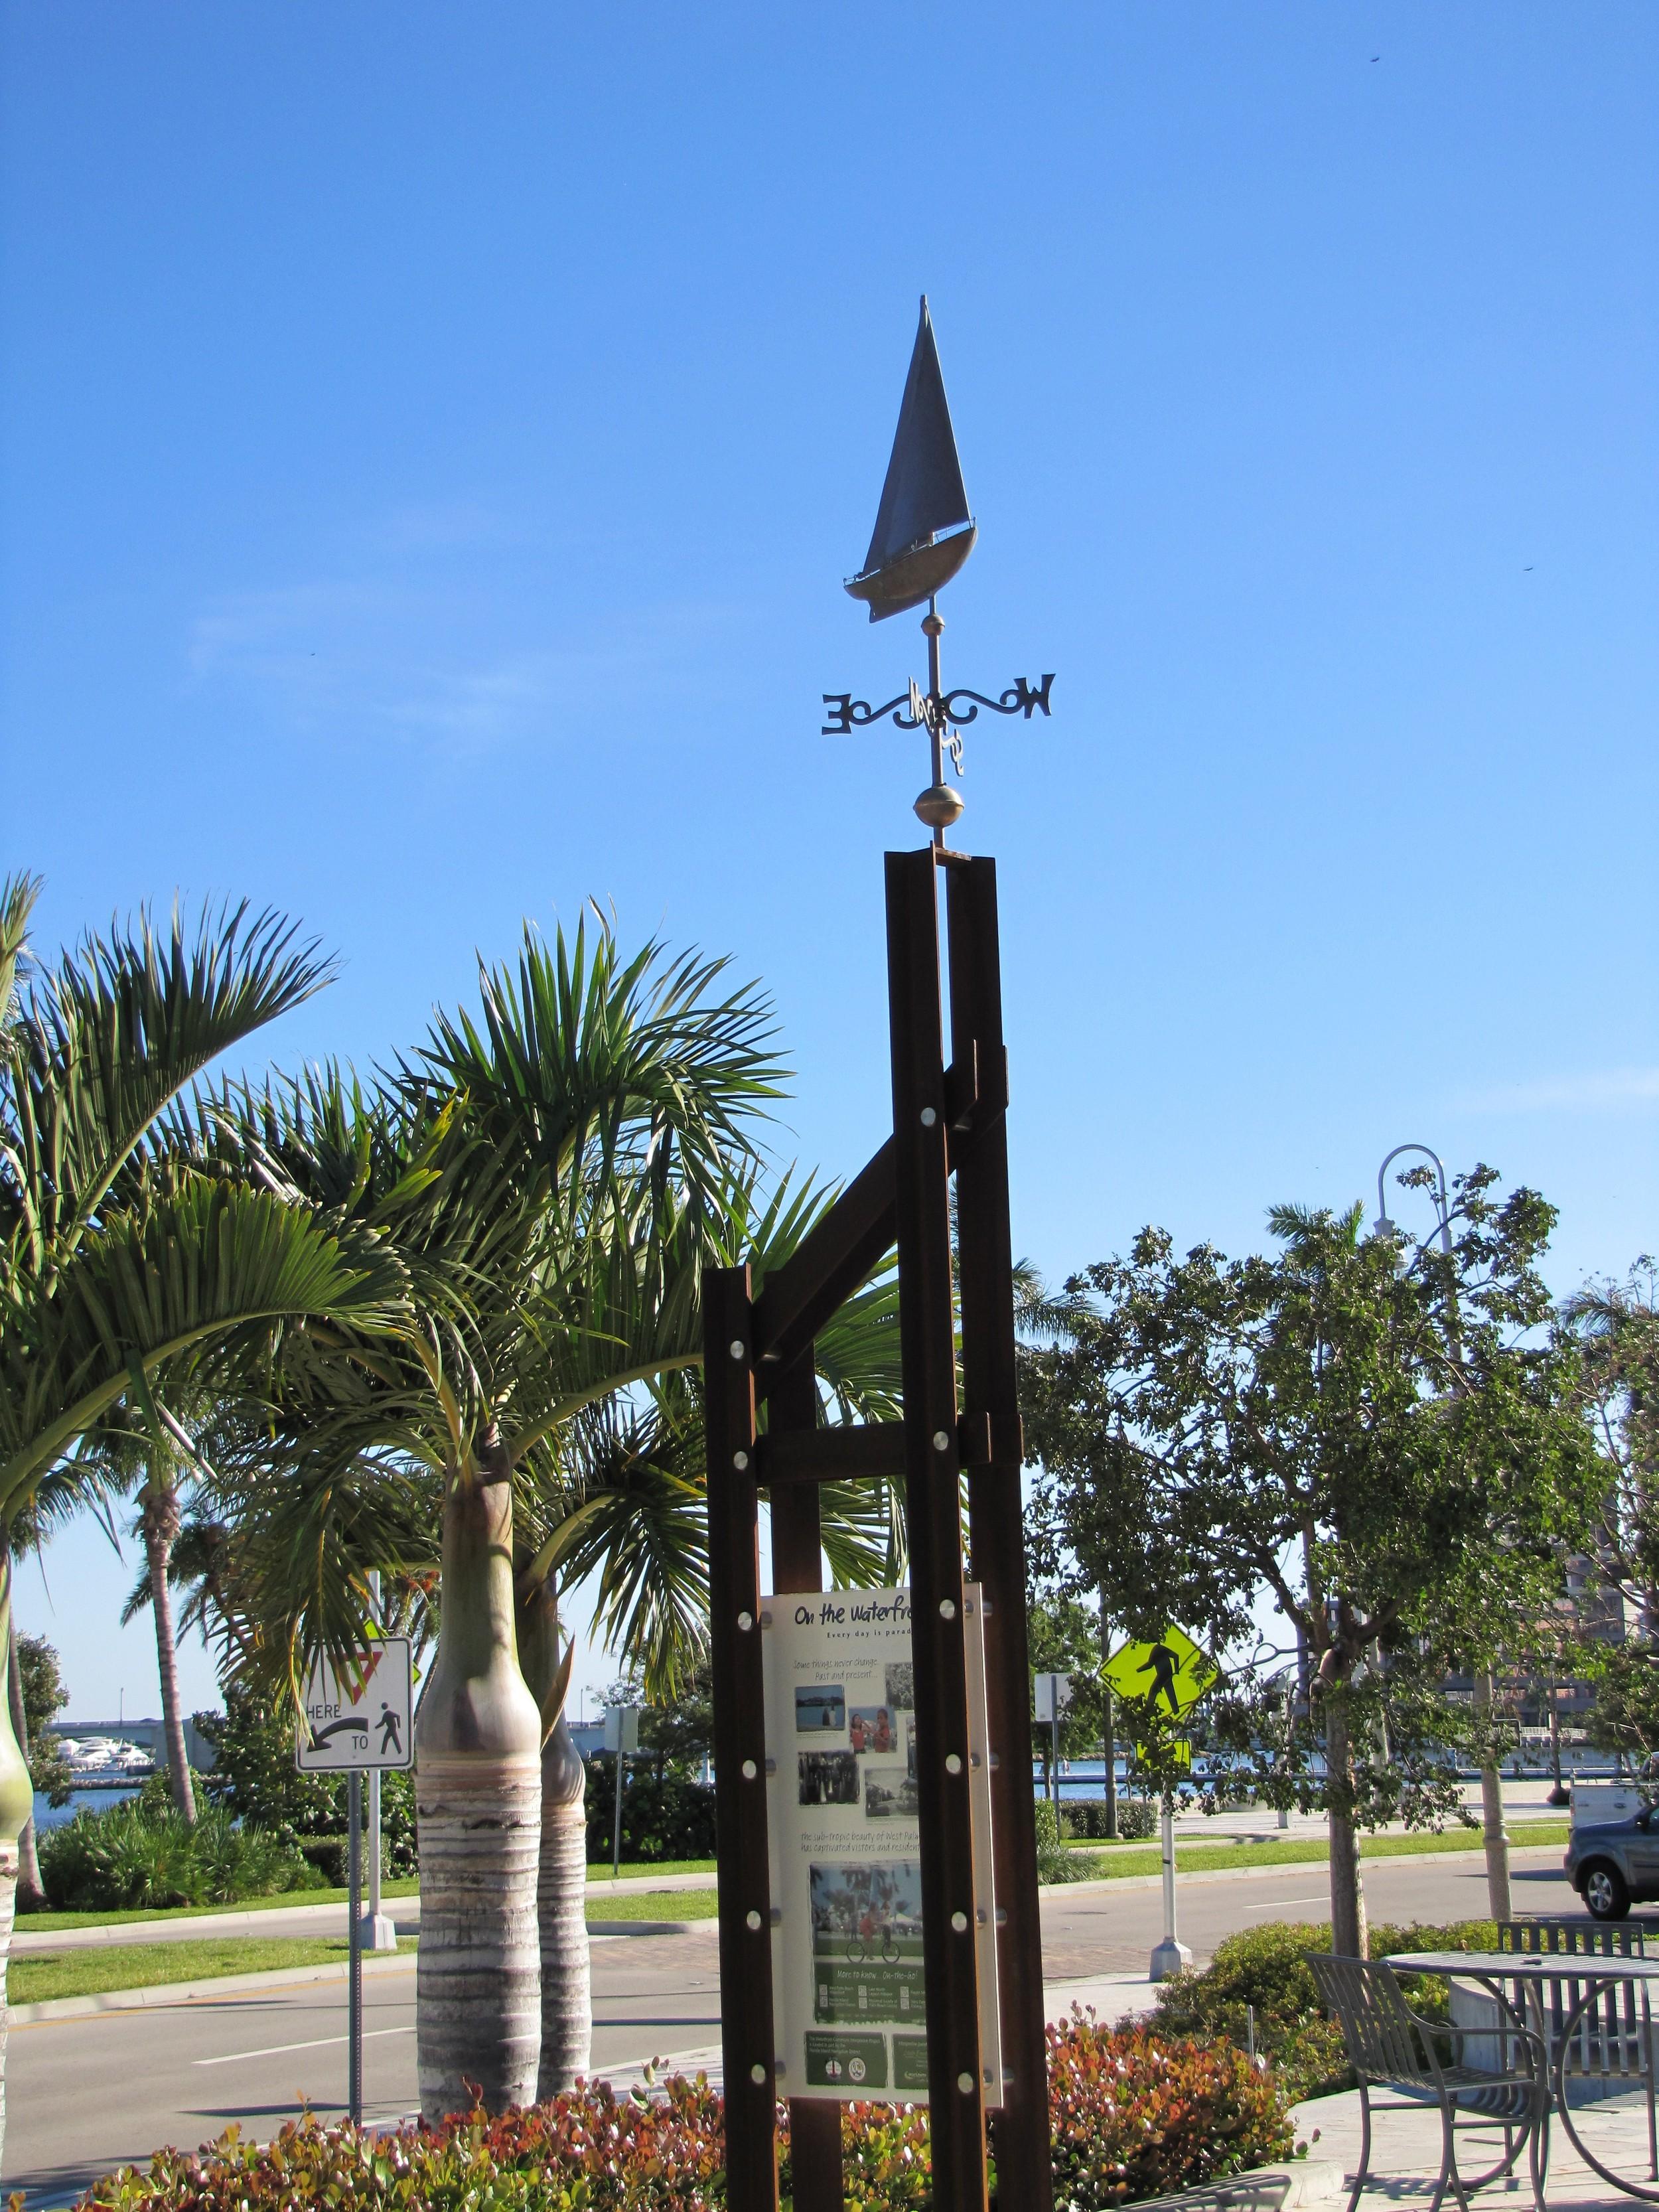 West Palm Beach Waterfront Interpretive Signage Sailboat Weather Vane.JPG